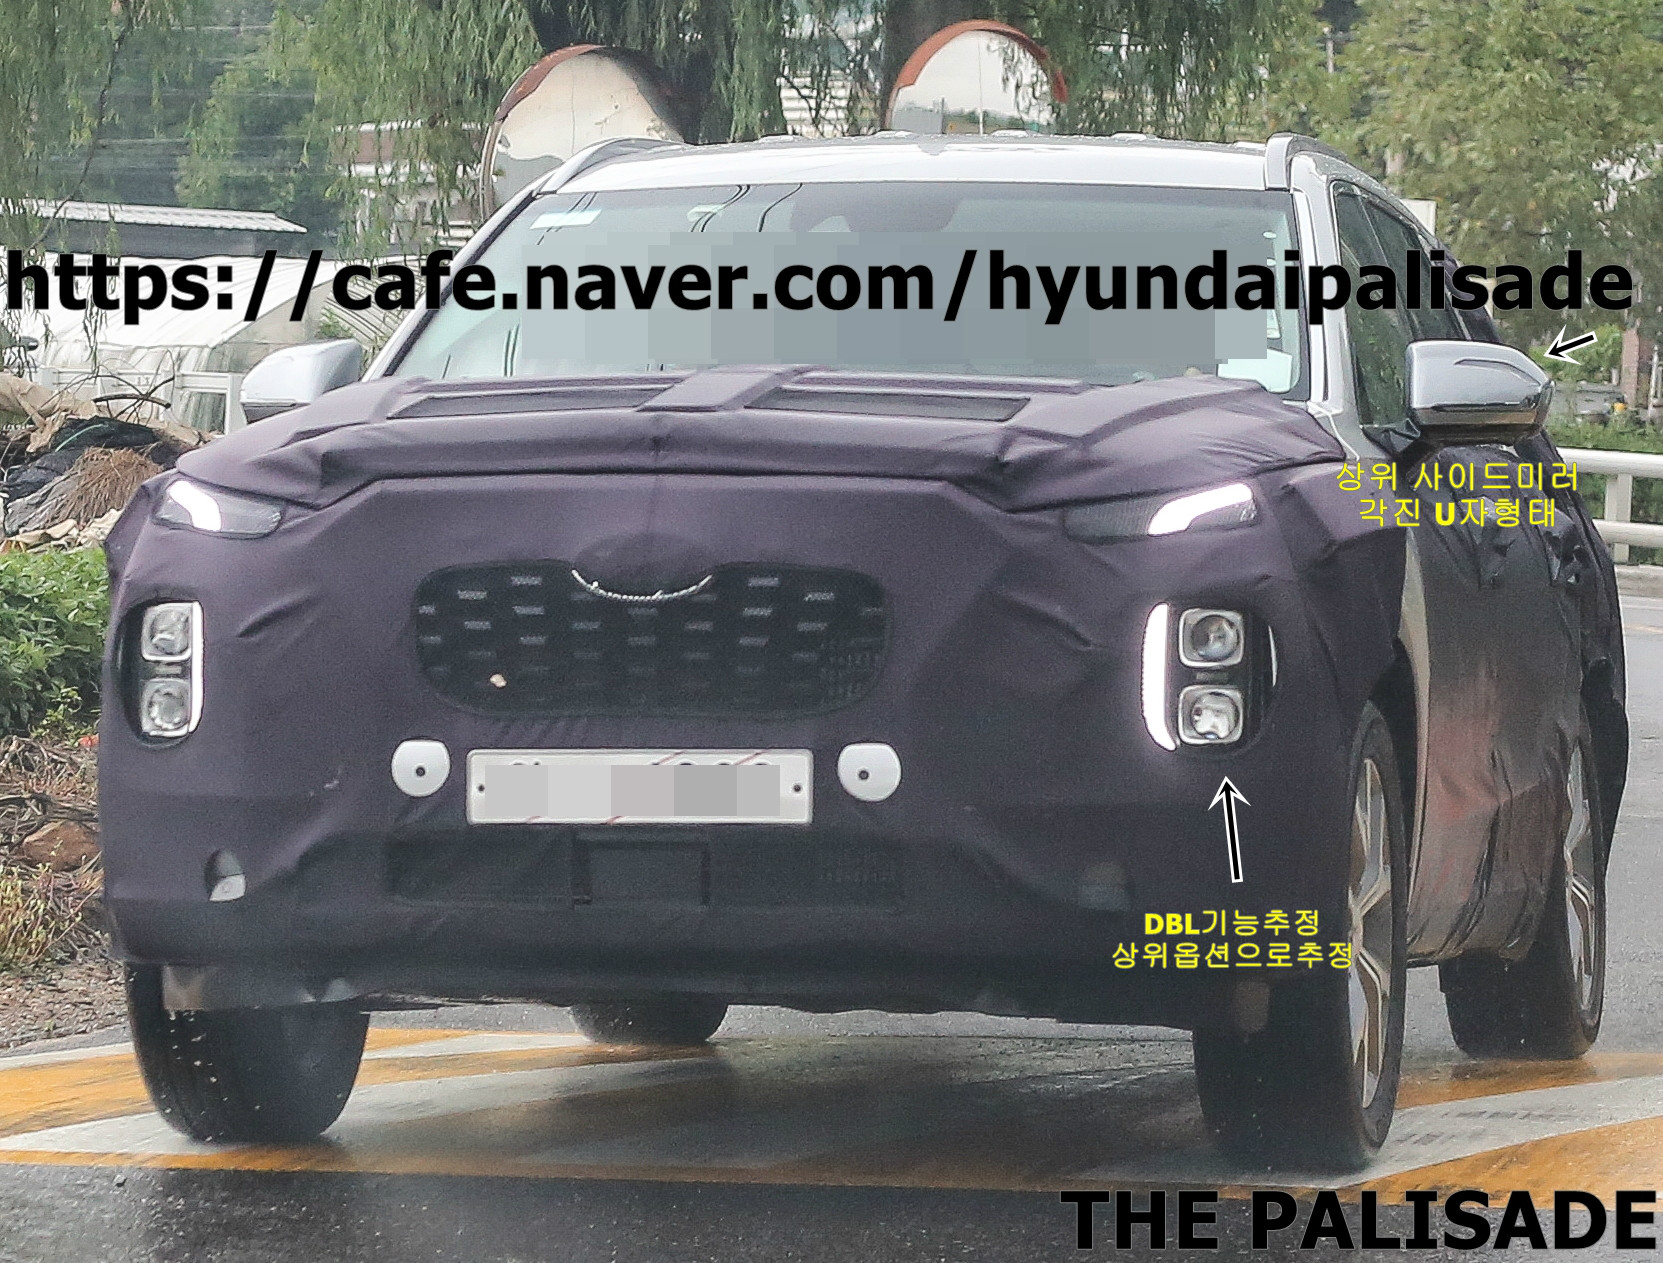 Hyundai Palisade Spied in South Korea